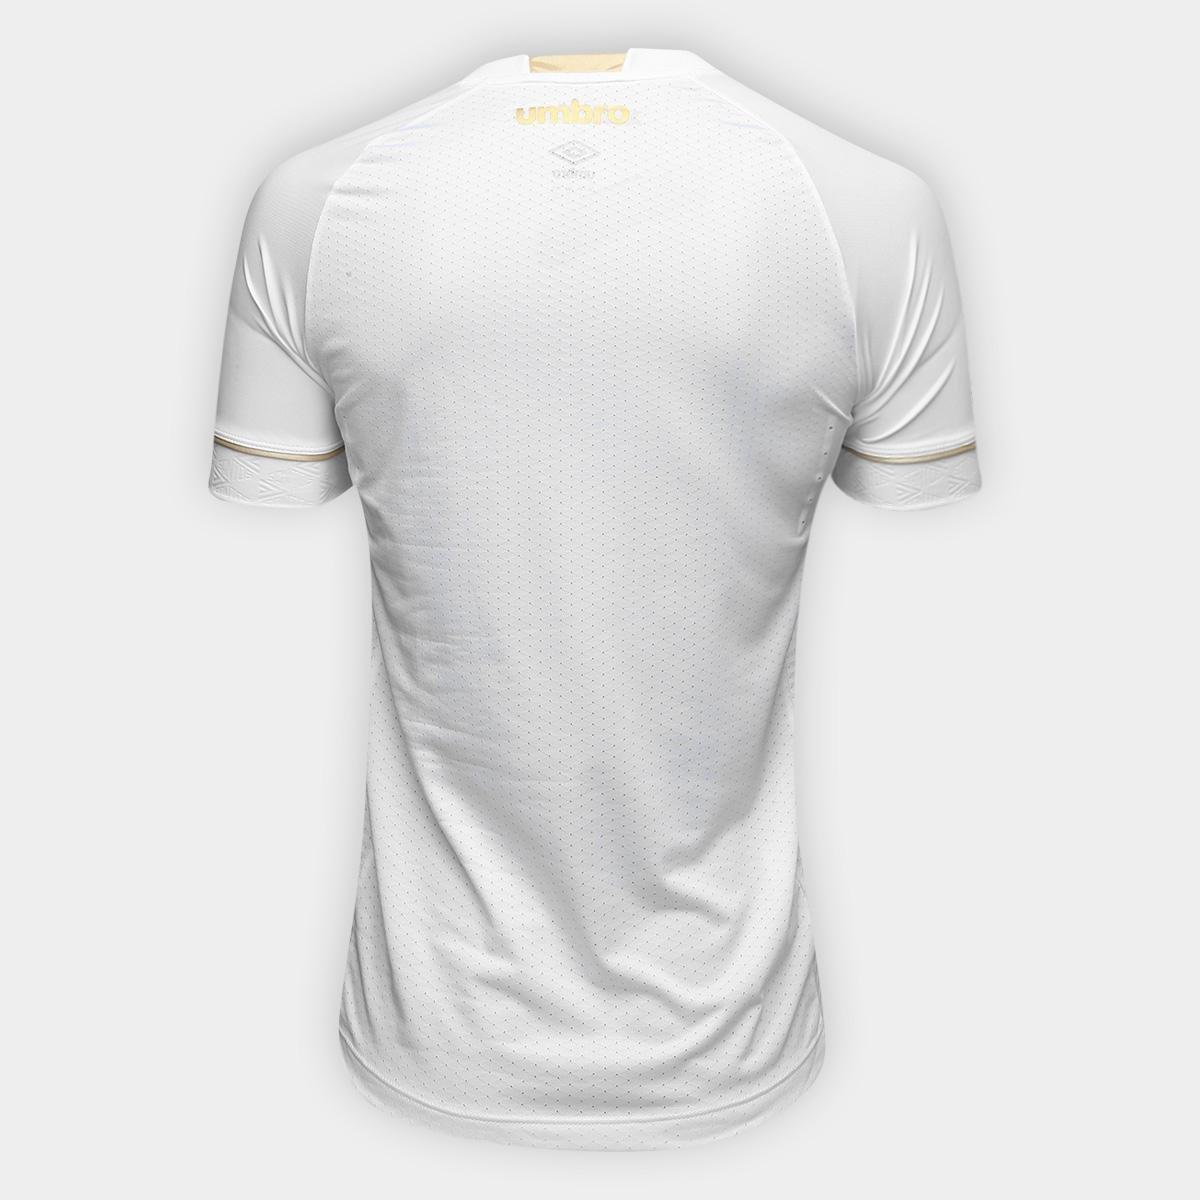 a20f886a14 Camisa Santos I 2018 s n° Jogador Umbro Masculina - Branco e dourado ...